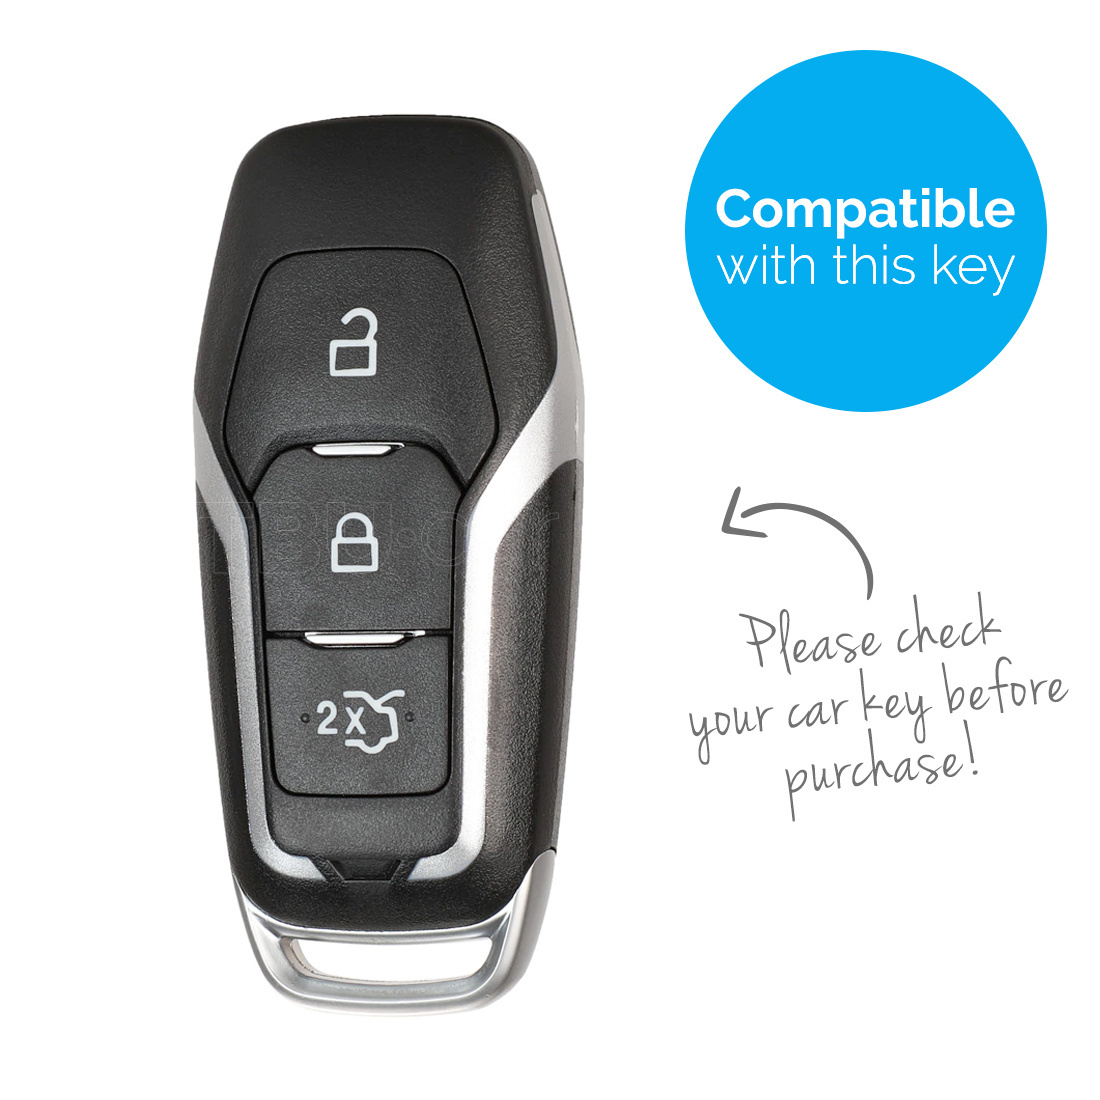 TBU car TBU car Autoschlüssel Hülle kompatibel mit Ford 3 Tasten (Keyless Entry) - Schutzhülle aus Silikon - Auto Schlüsselhülle Cover in Zebra